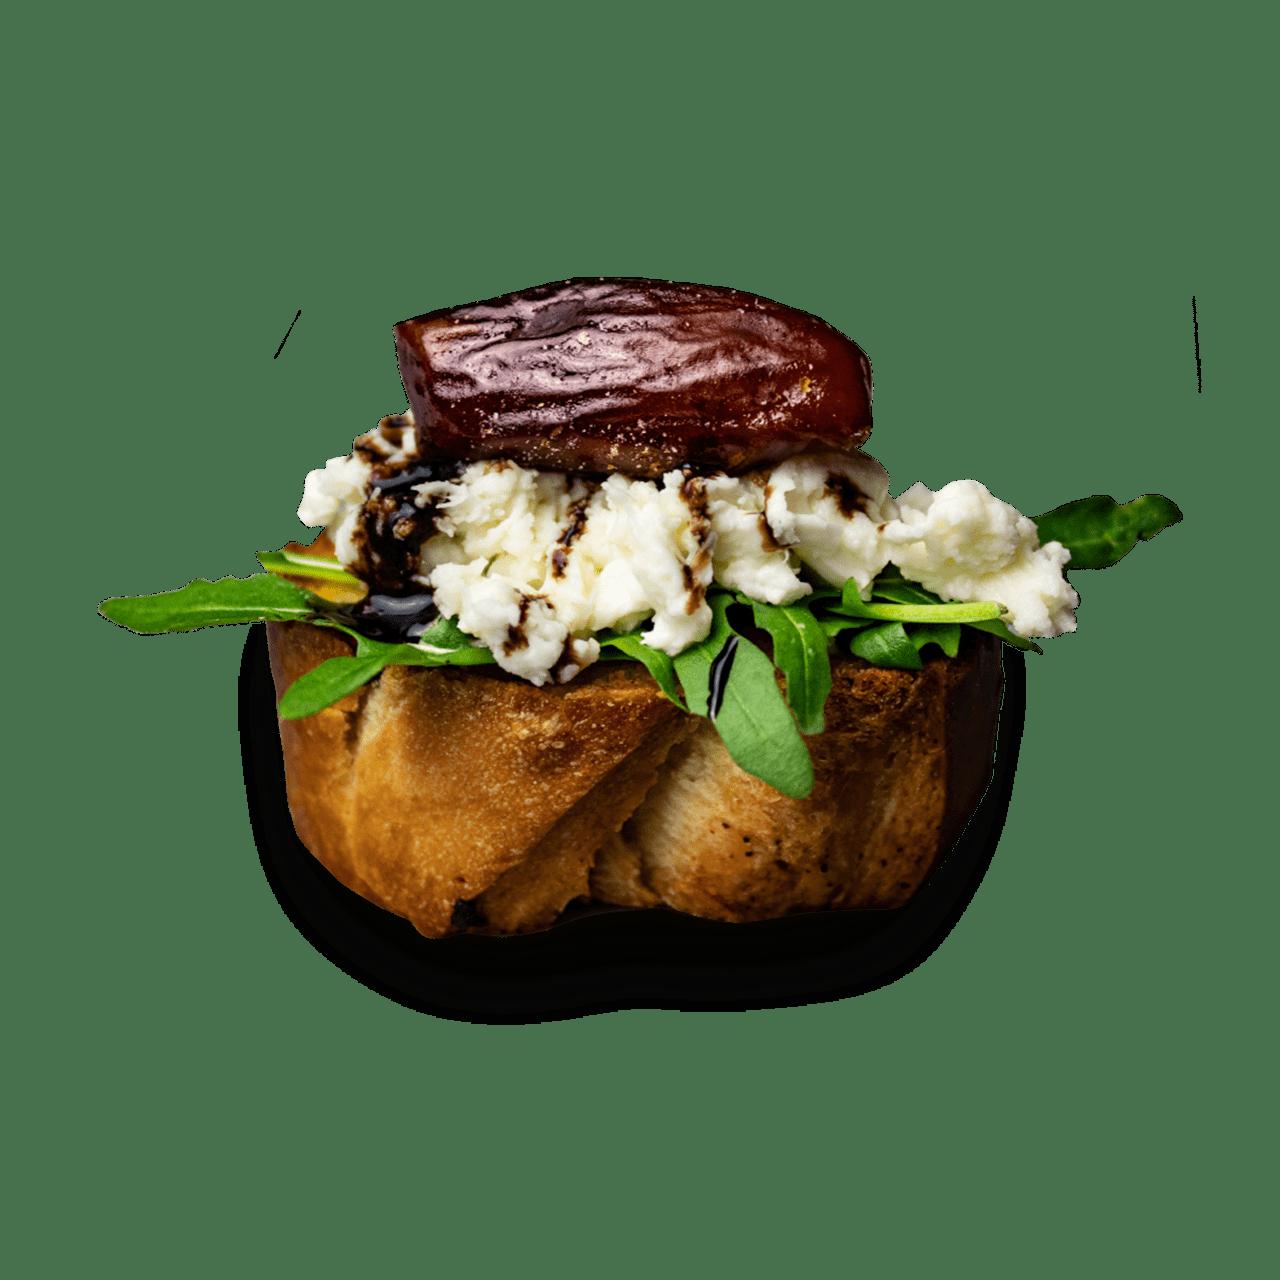 tostibanaan-bruschetta-dadel-mozzarella-rucola